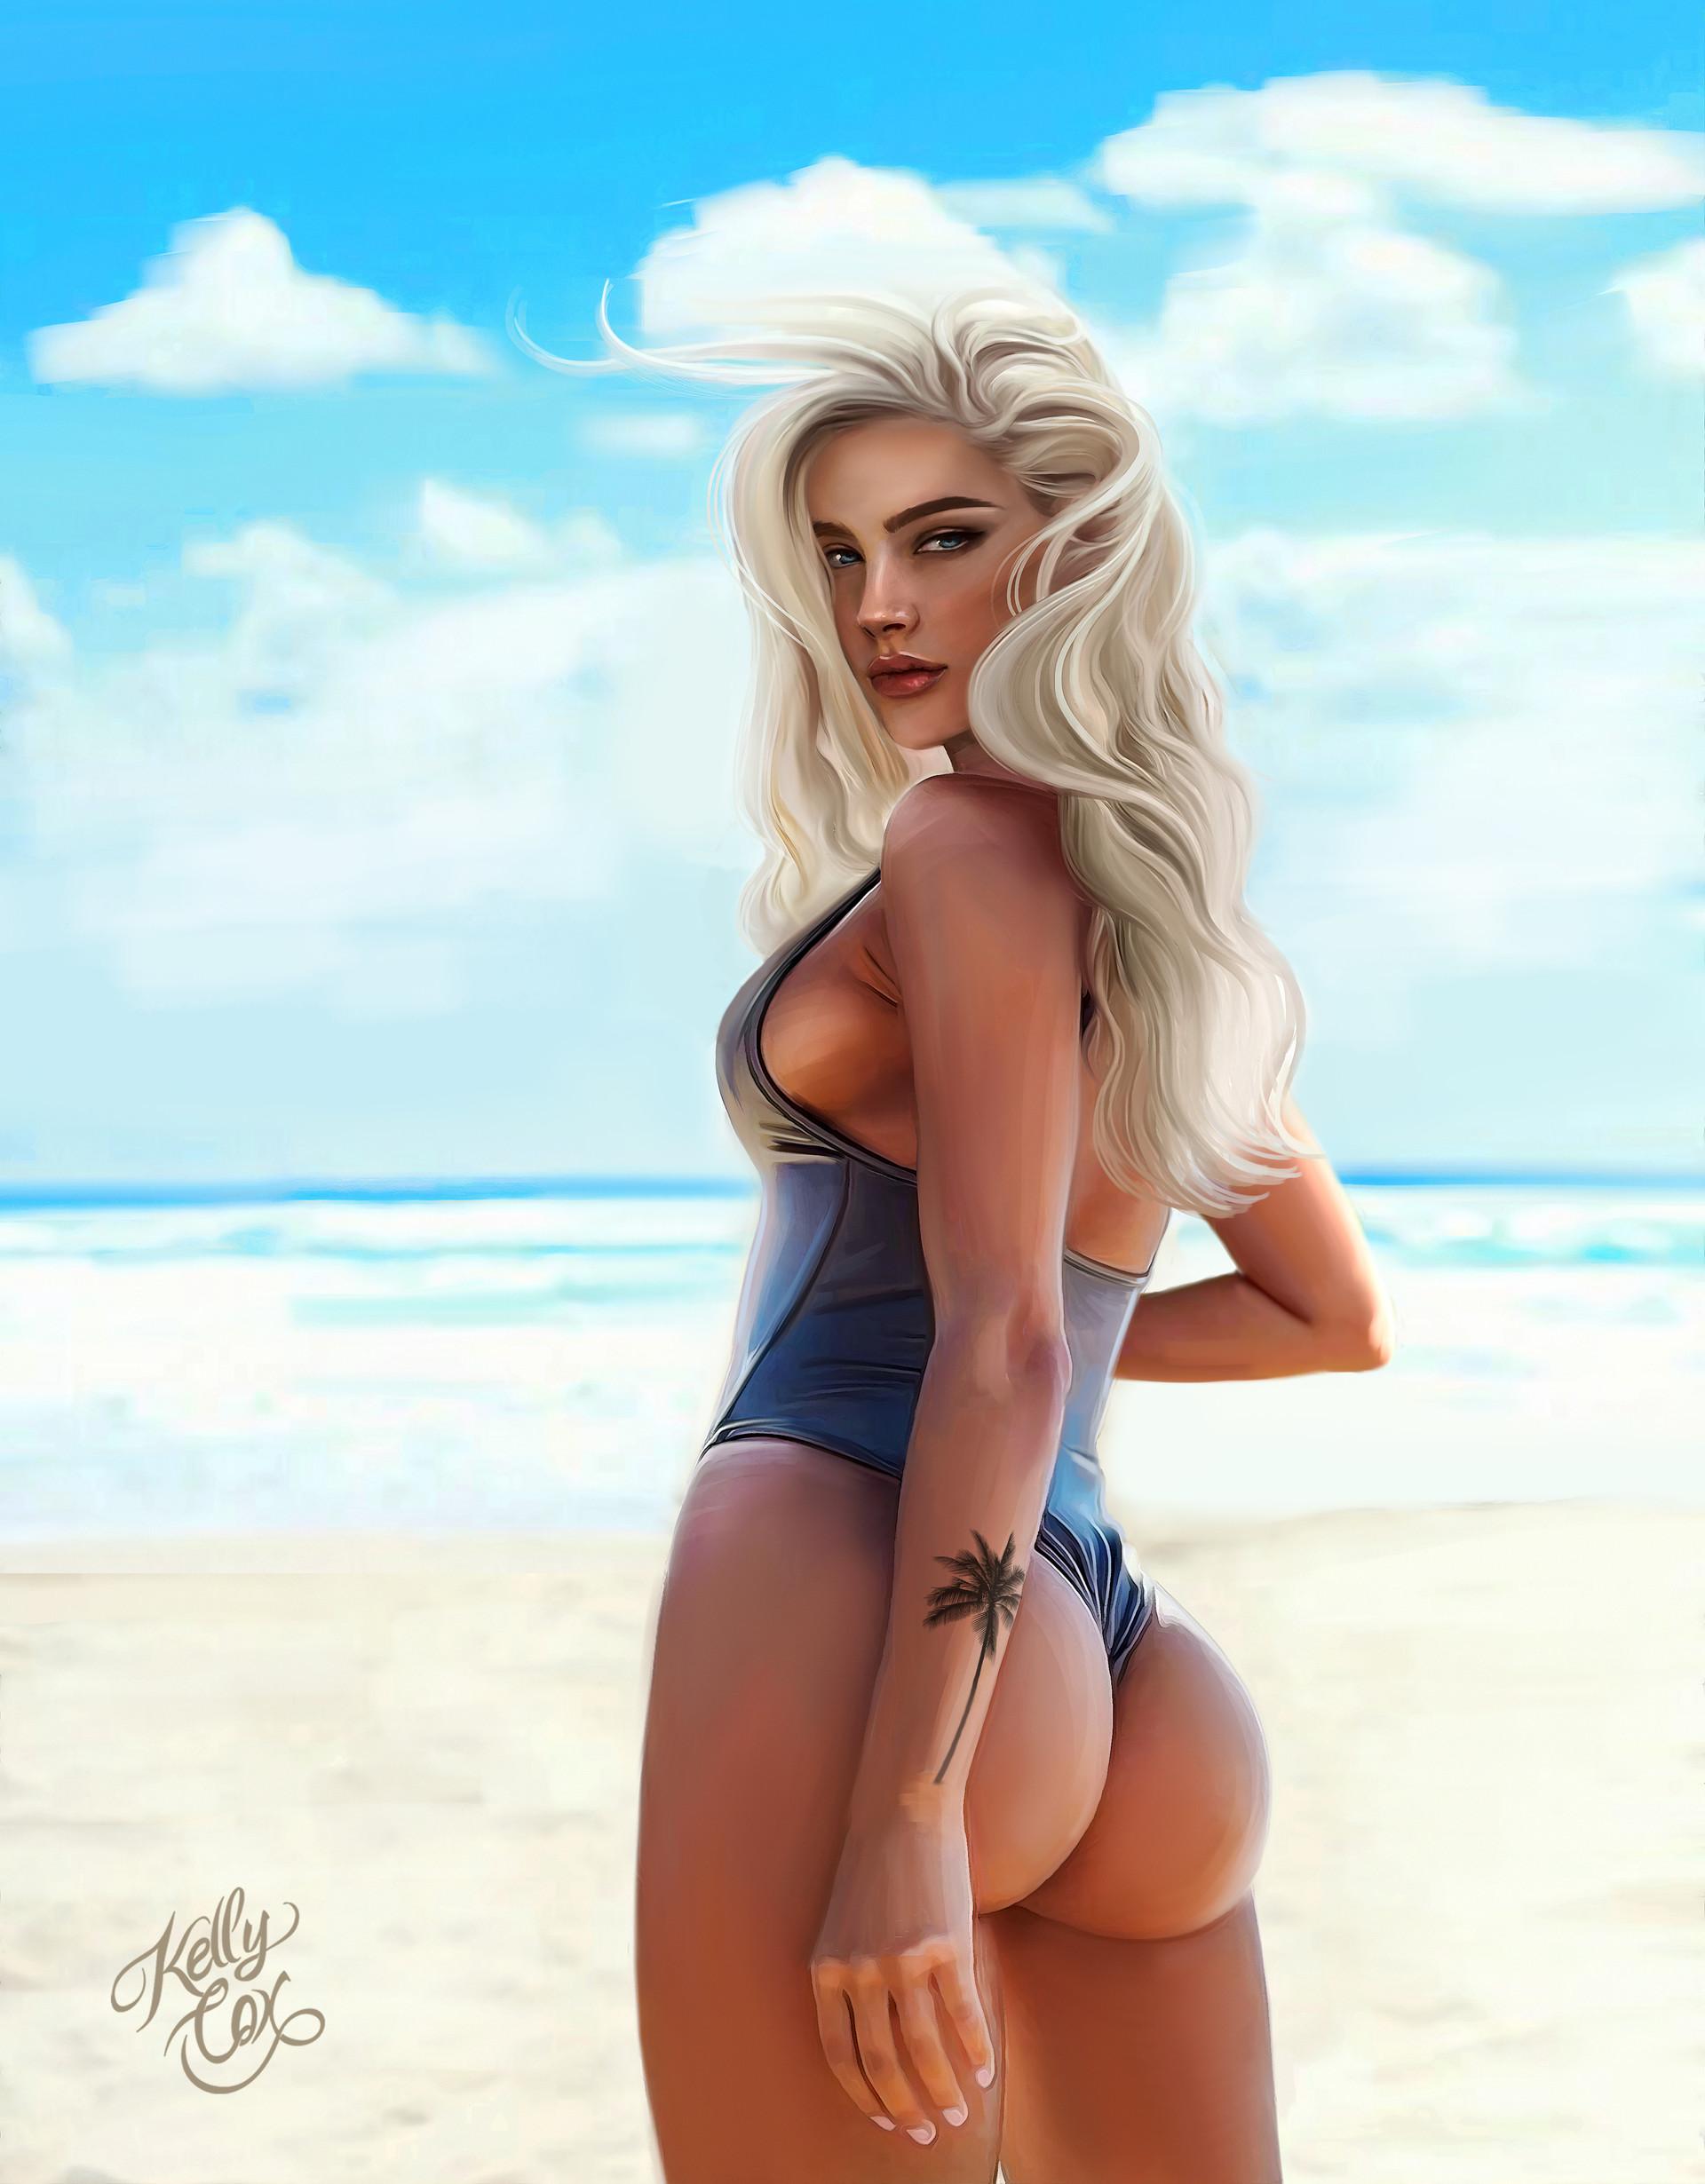 Kelly cox girl beach